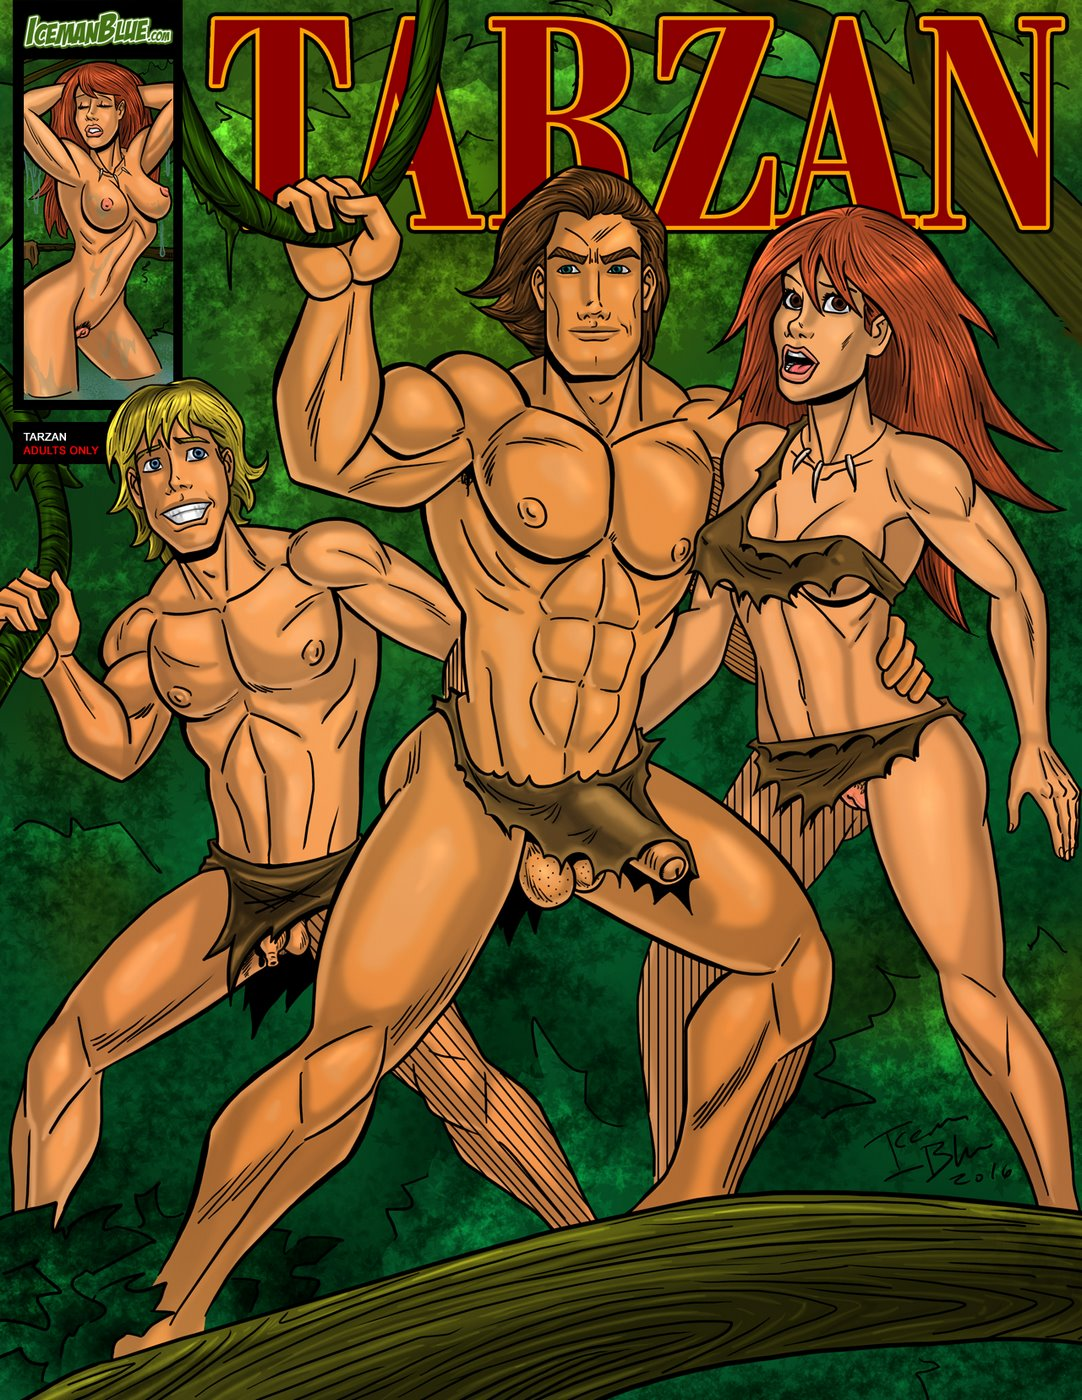 Iceman Blue- Tarzan image 1